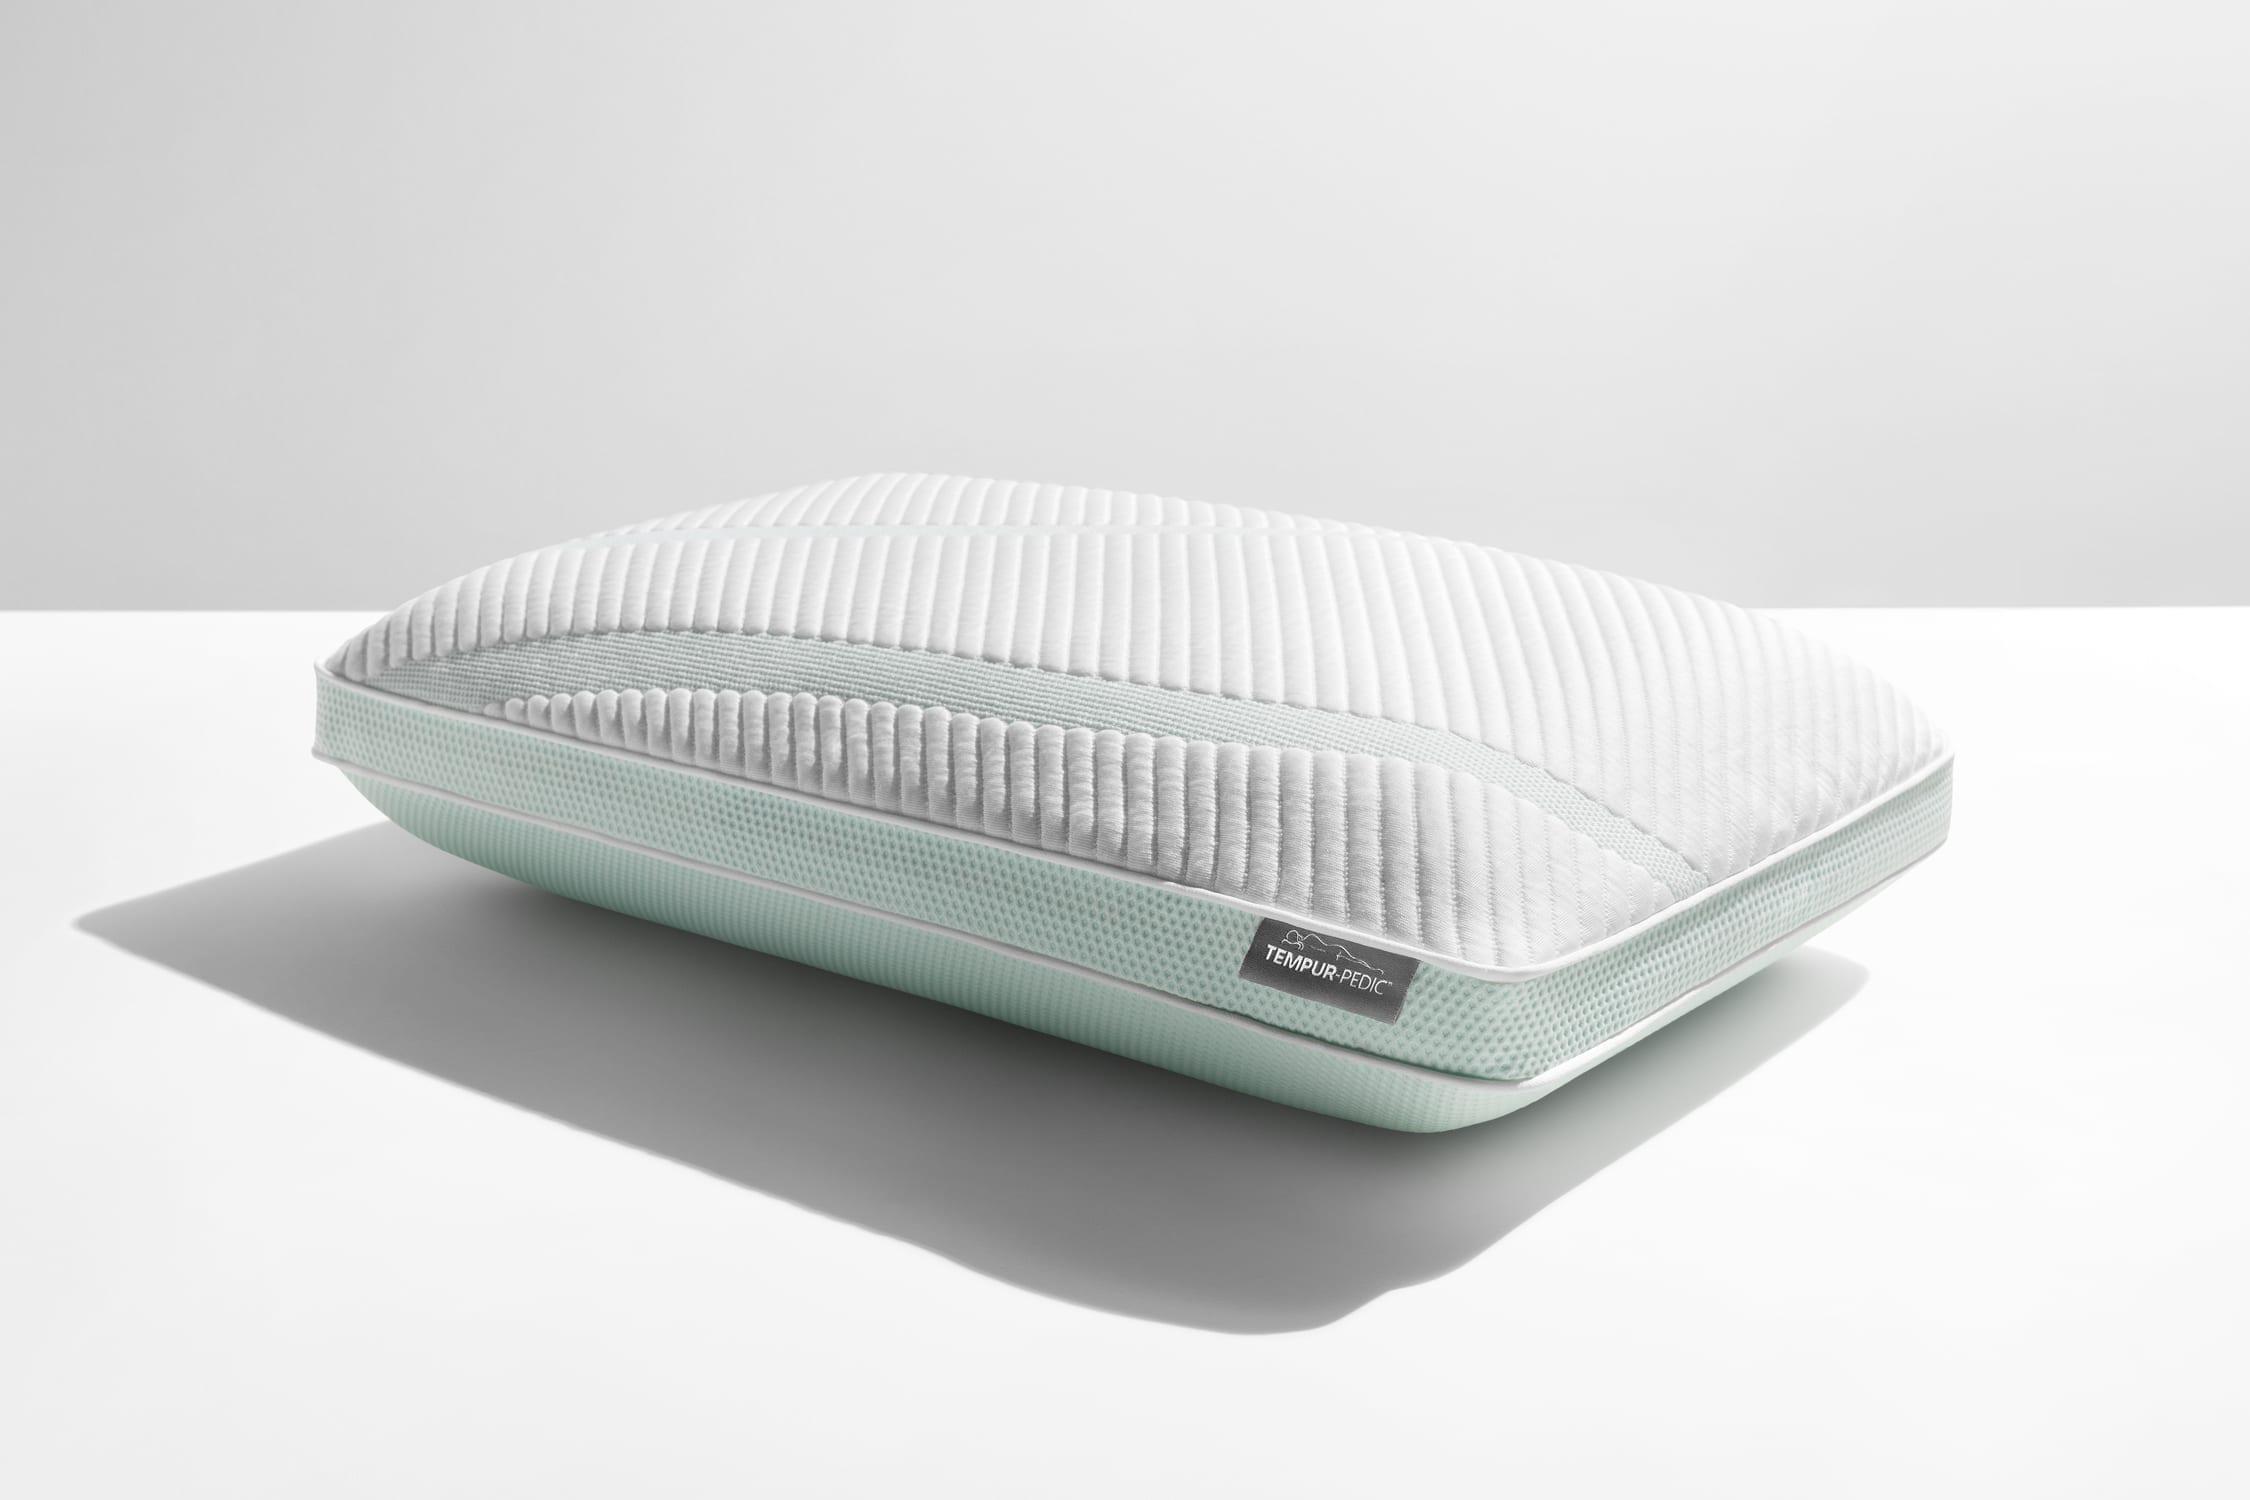 Tempurpedic Pro Hi Pillow Best Mattress